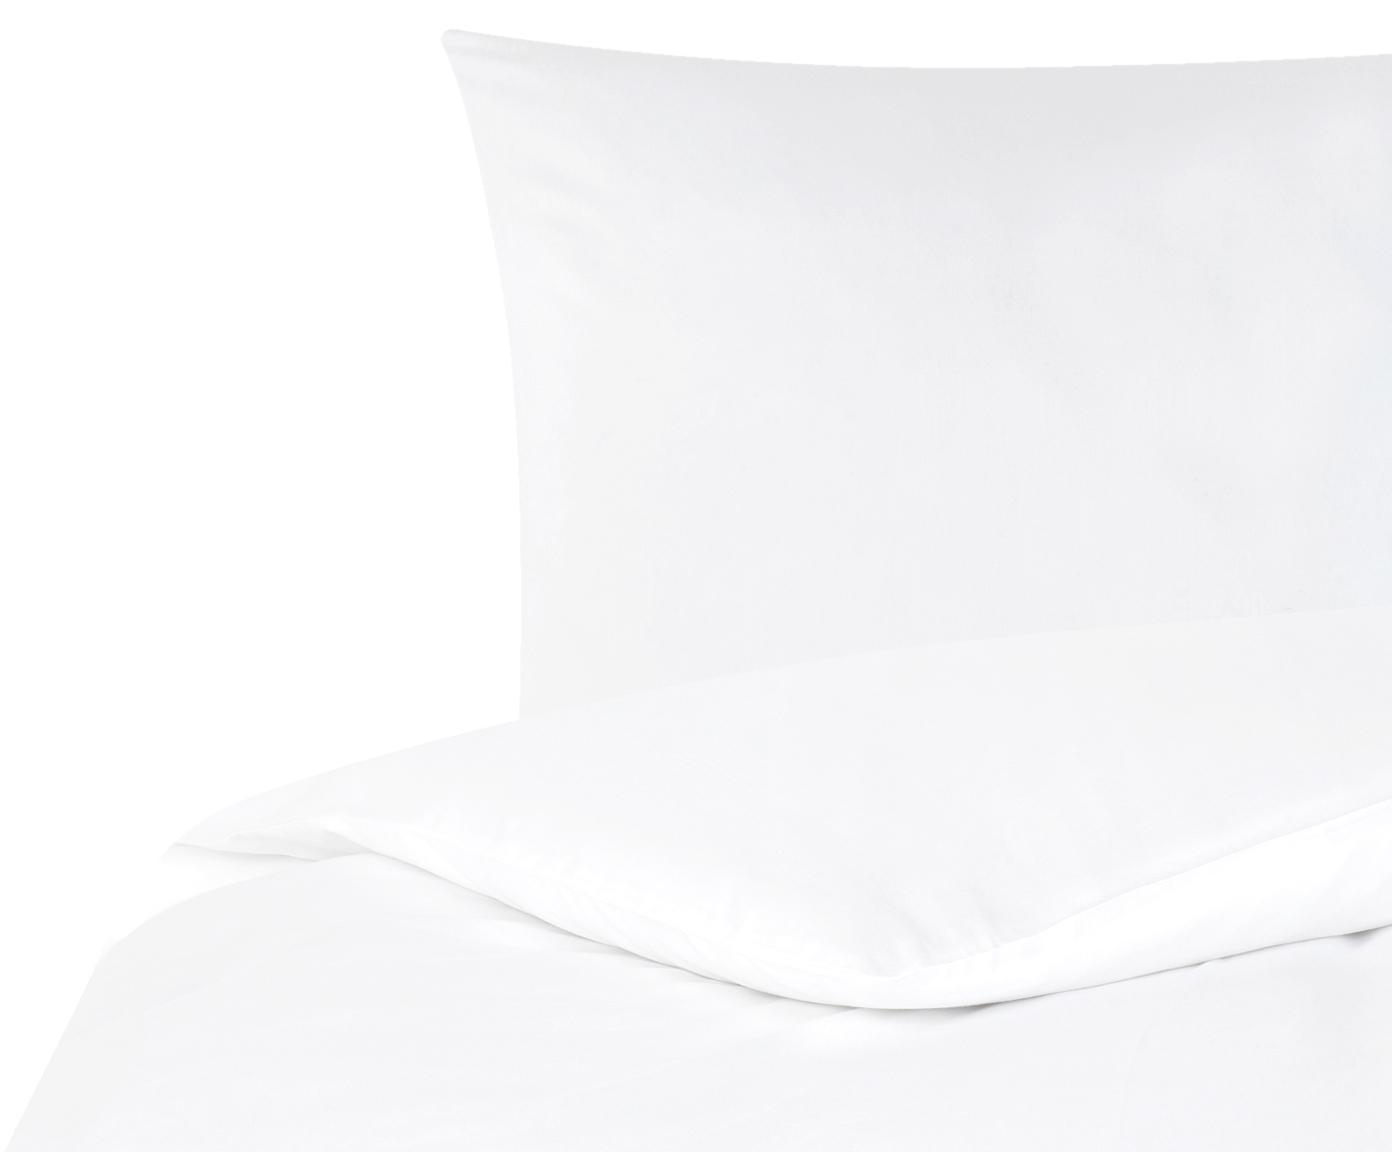 Funda nórdica de satén Comfort, Blanco, Cama 90 cm (150 x 200 cm)